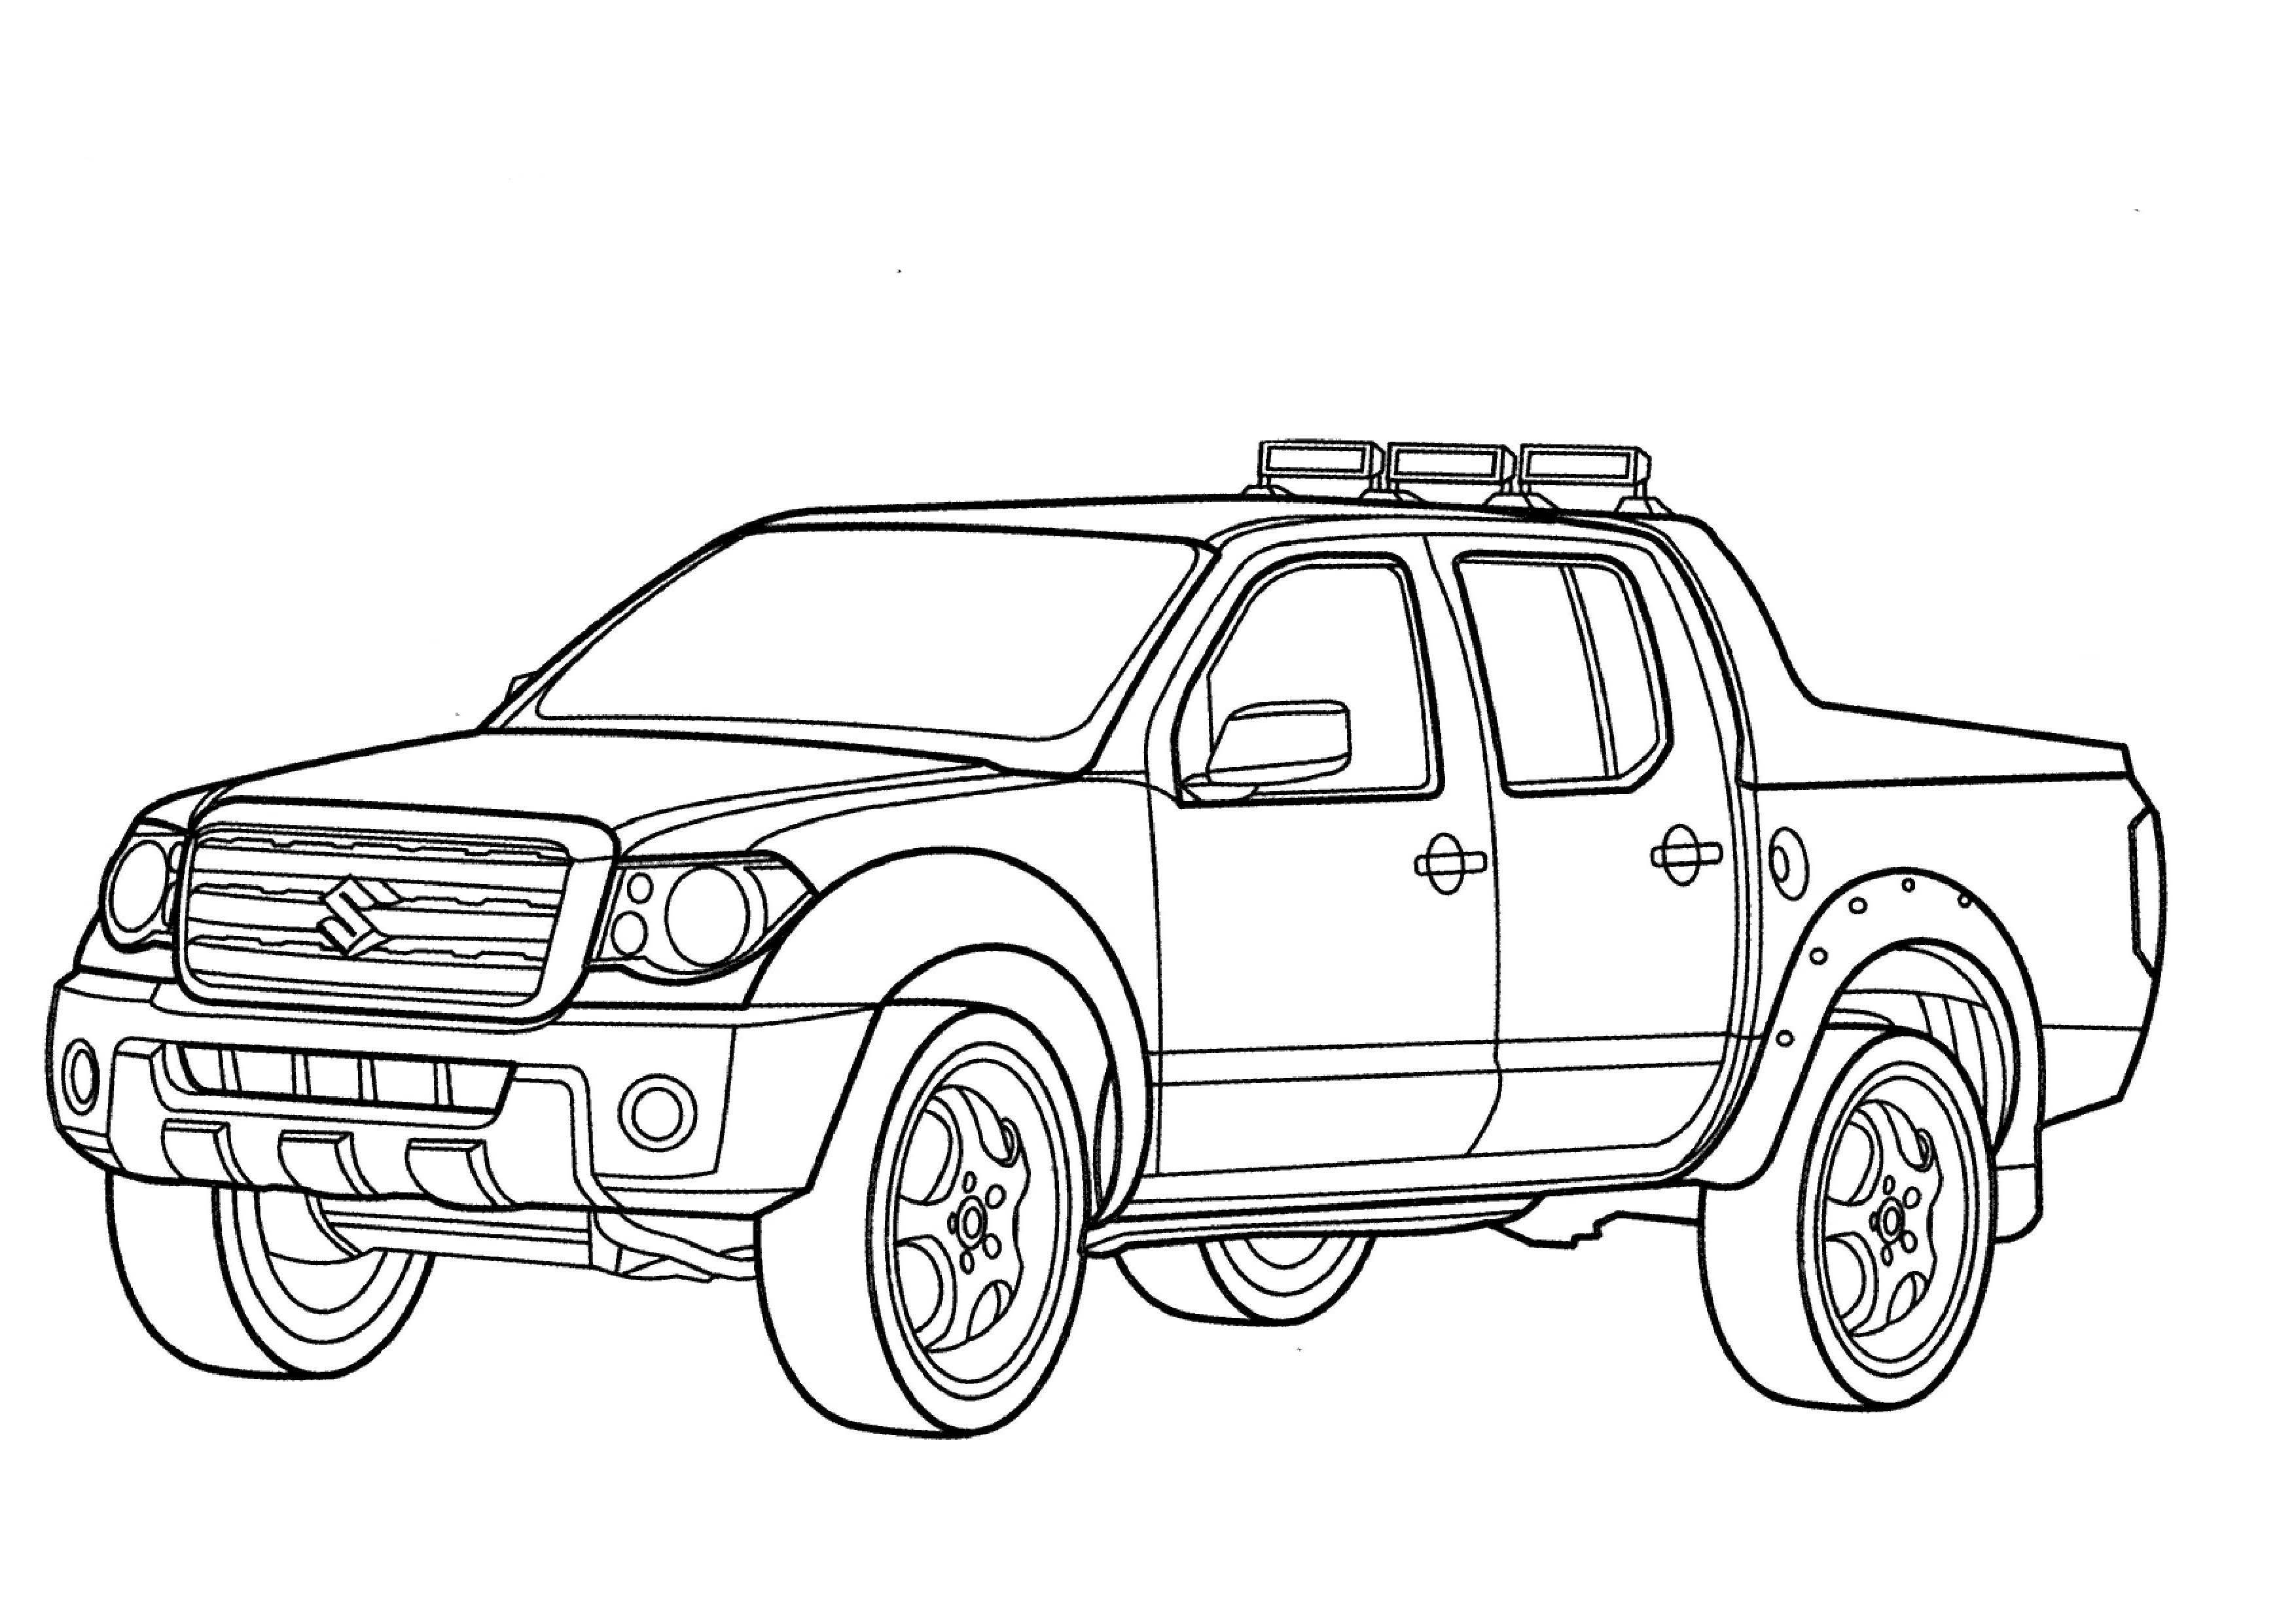 01 Chevy Truck Wiring Diagram Lights